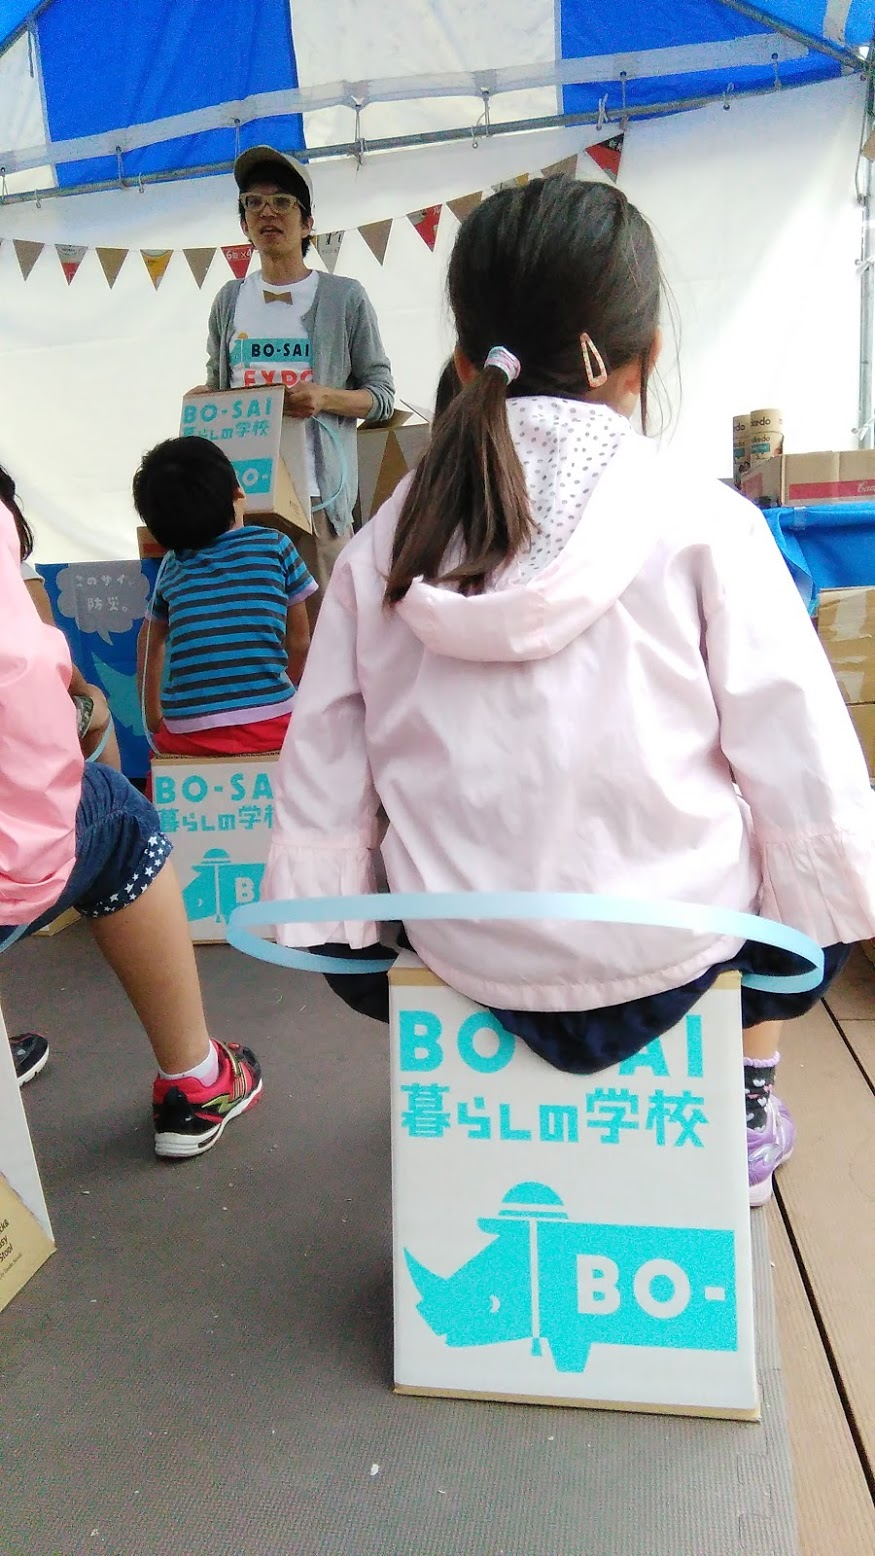 BO-SAI暮らしの学校2015